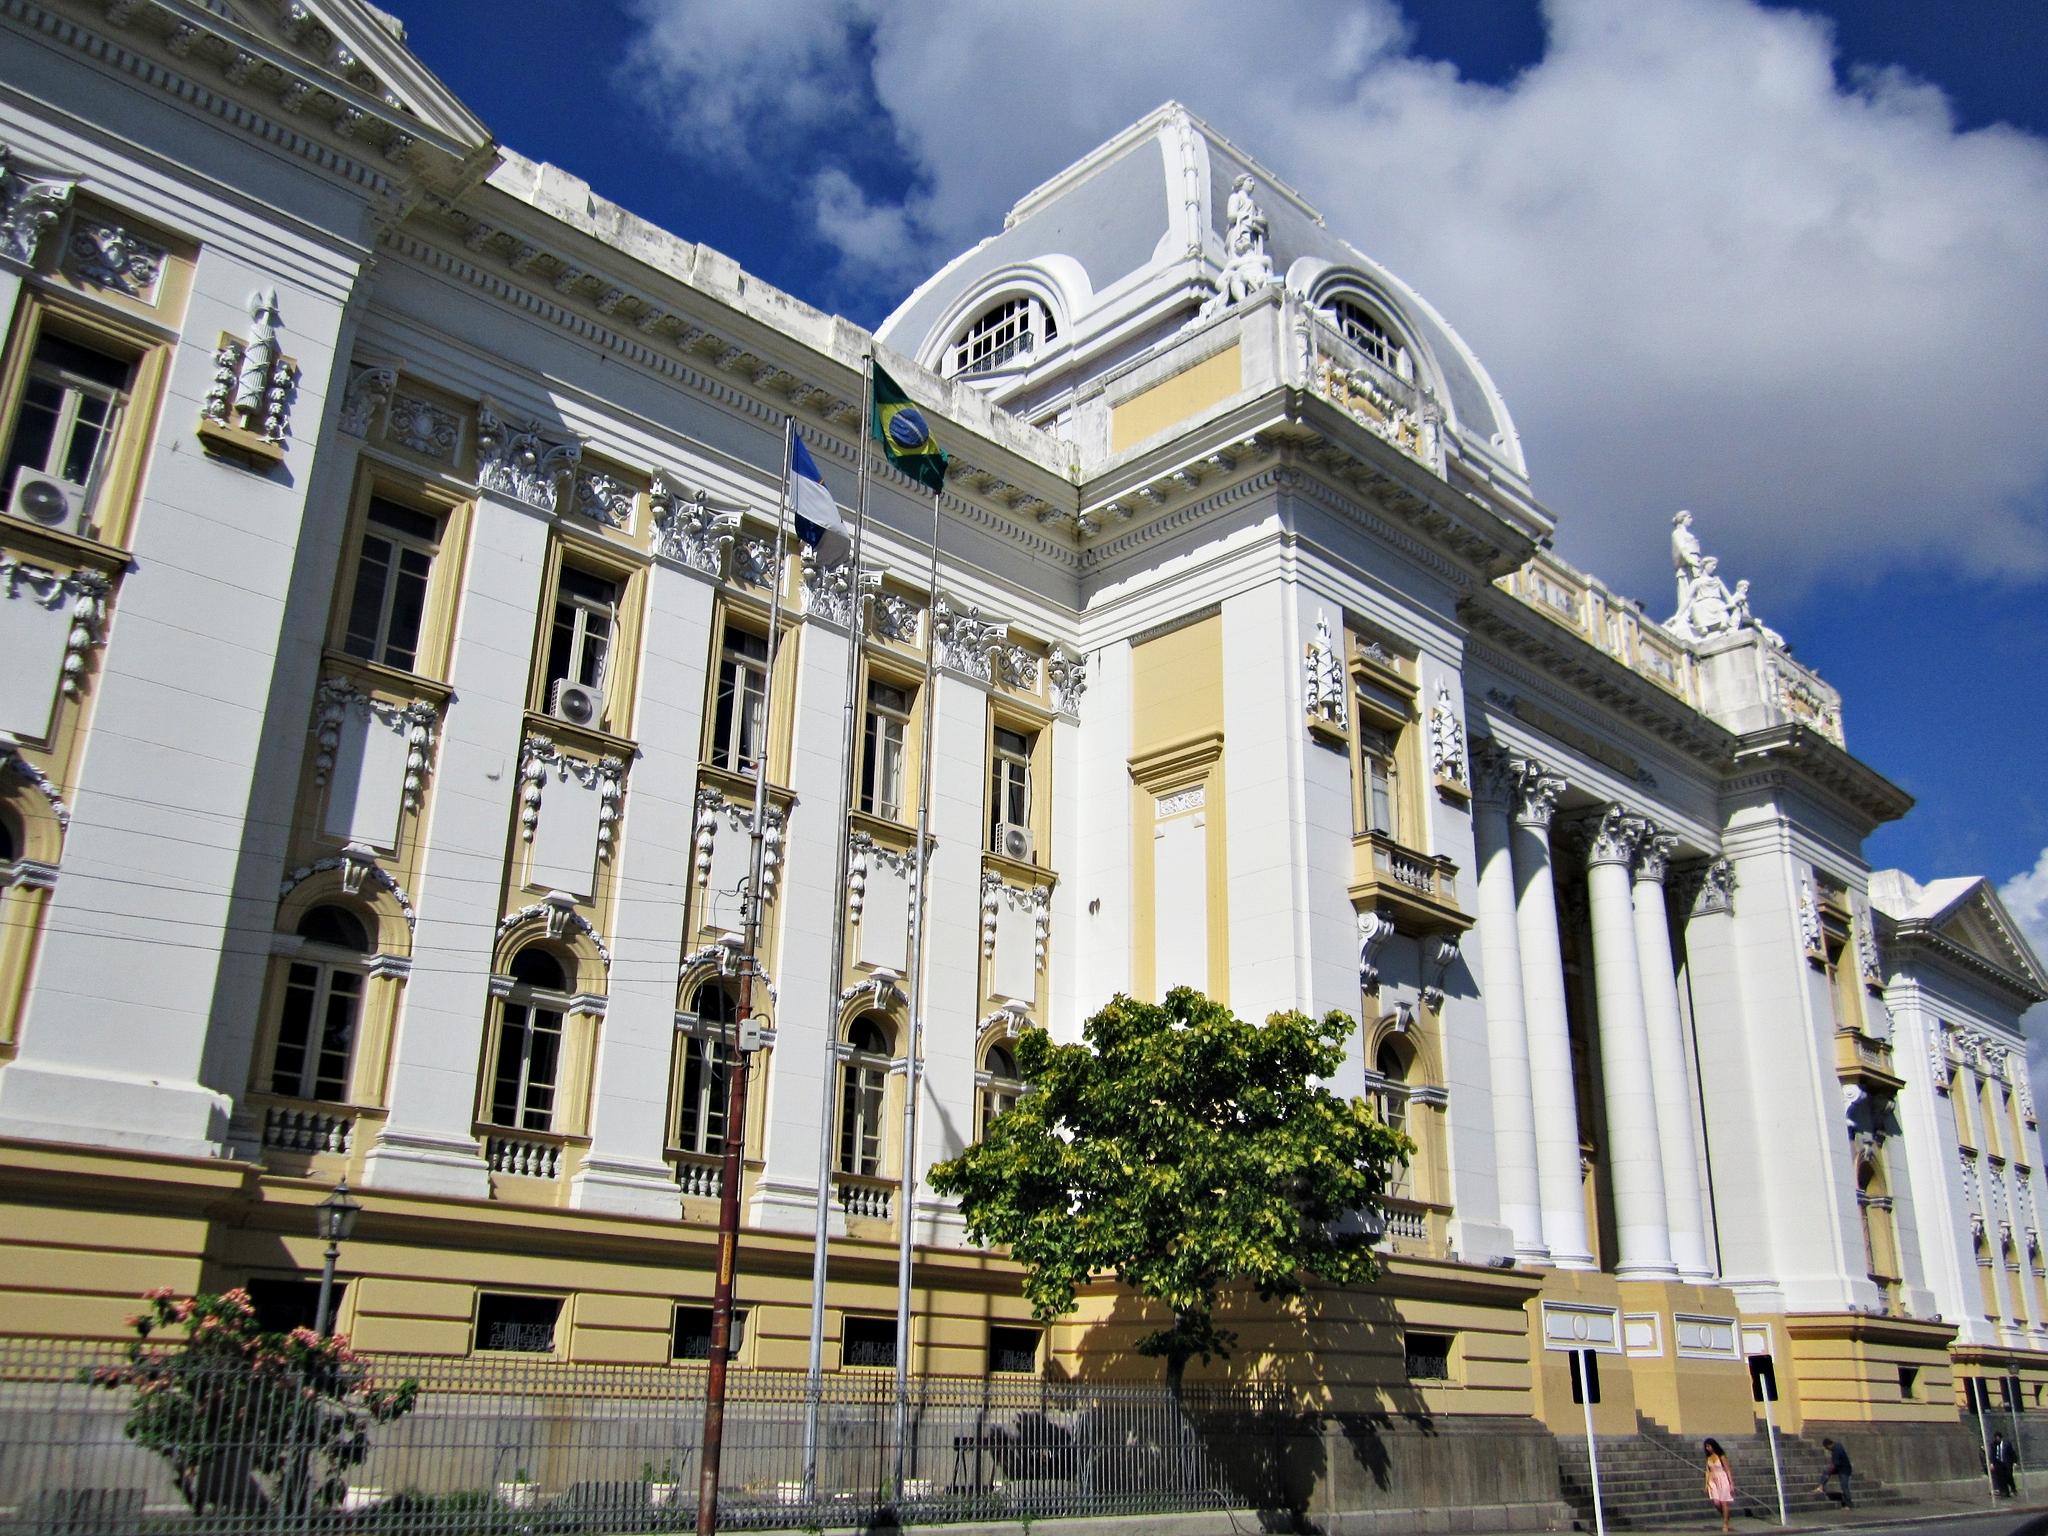 https://upload.wikimedia.org/wikipedia/commons/f/f1/Tribunal_de_Justi%C3%A7a_de_Pernambuco_-_Recife%2C_Pernambuco%2C_Brasil.jpg